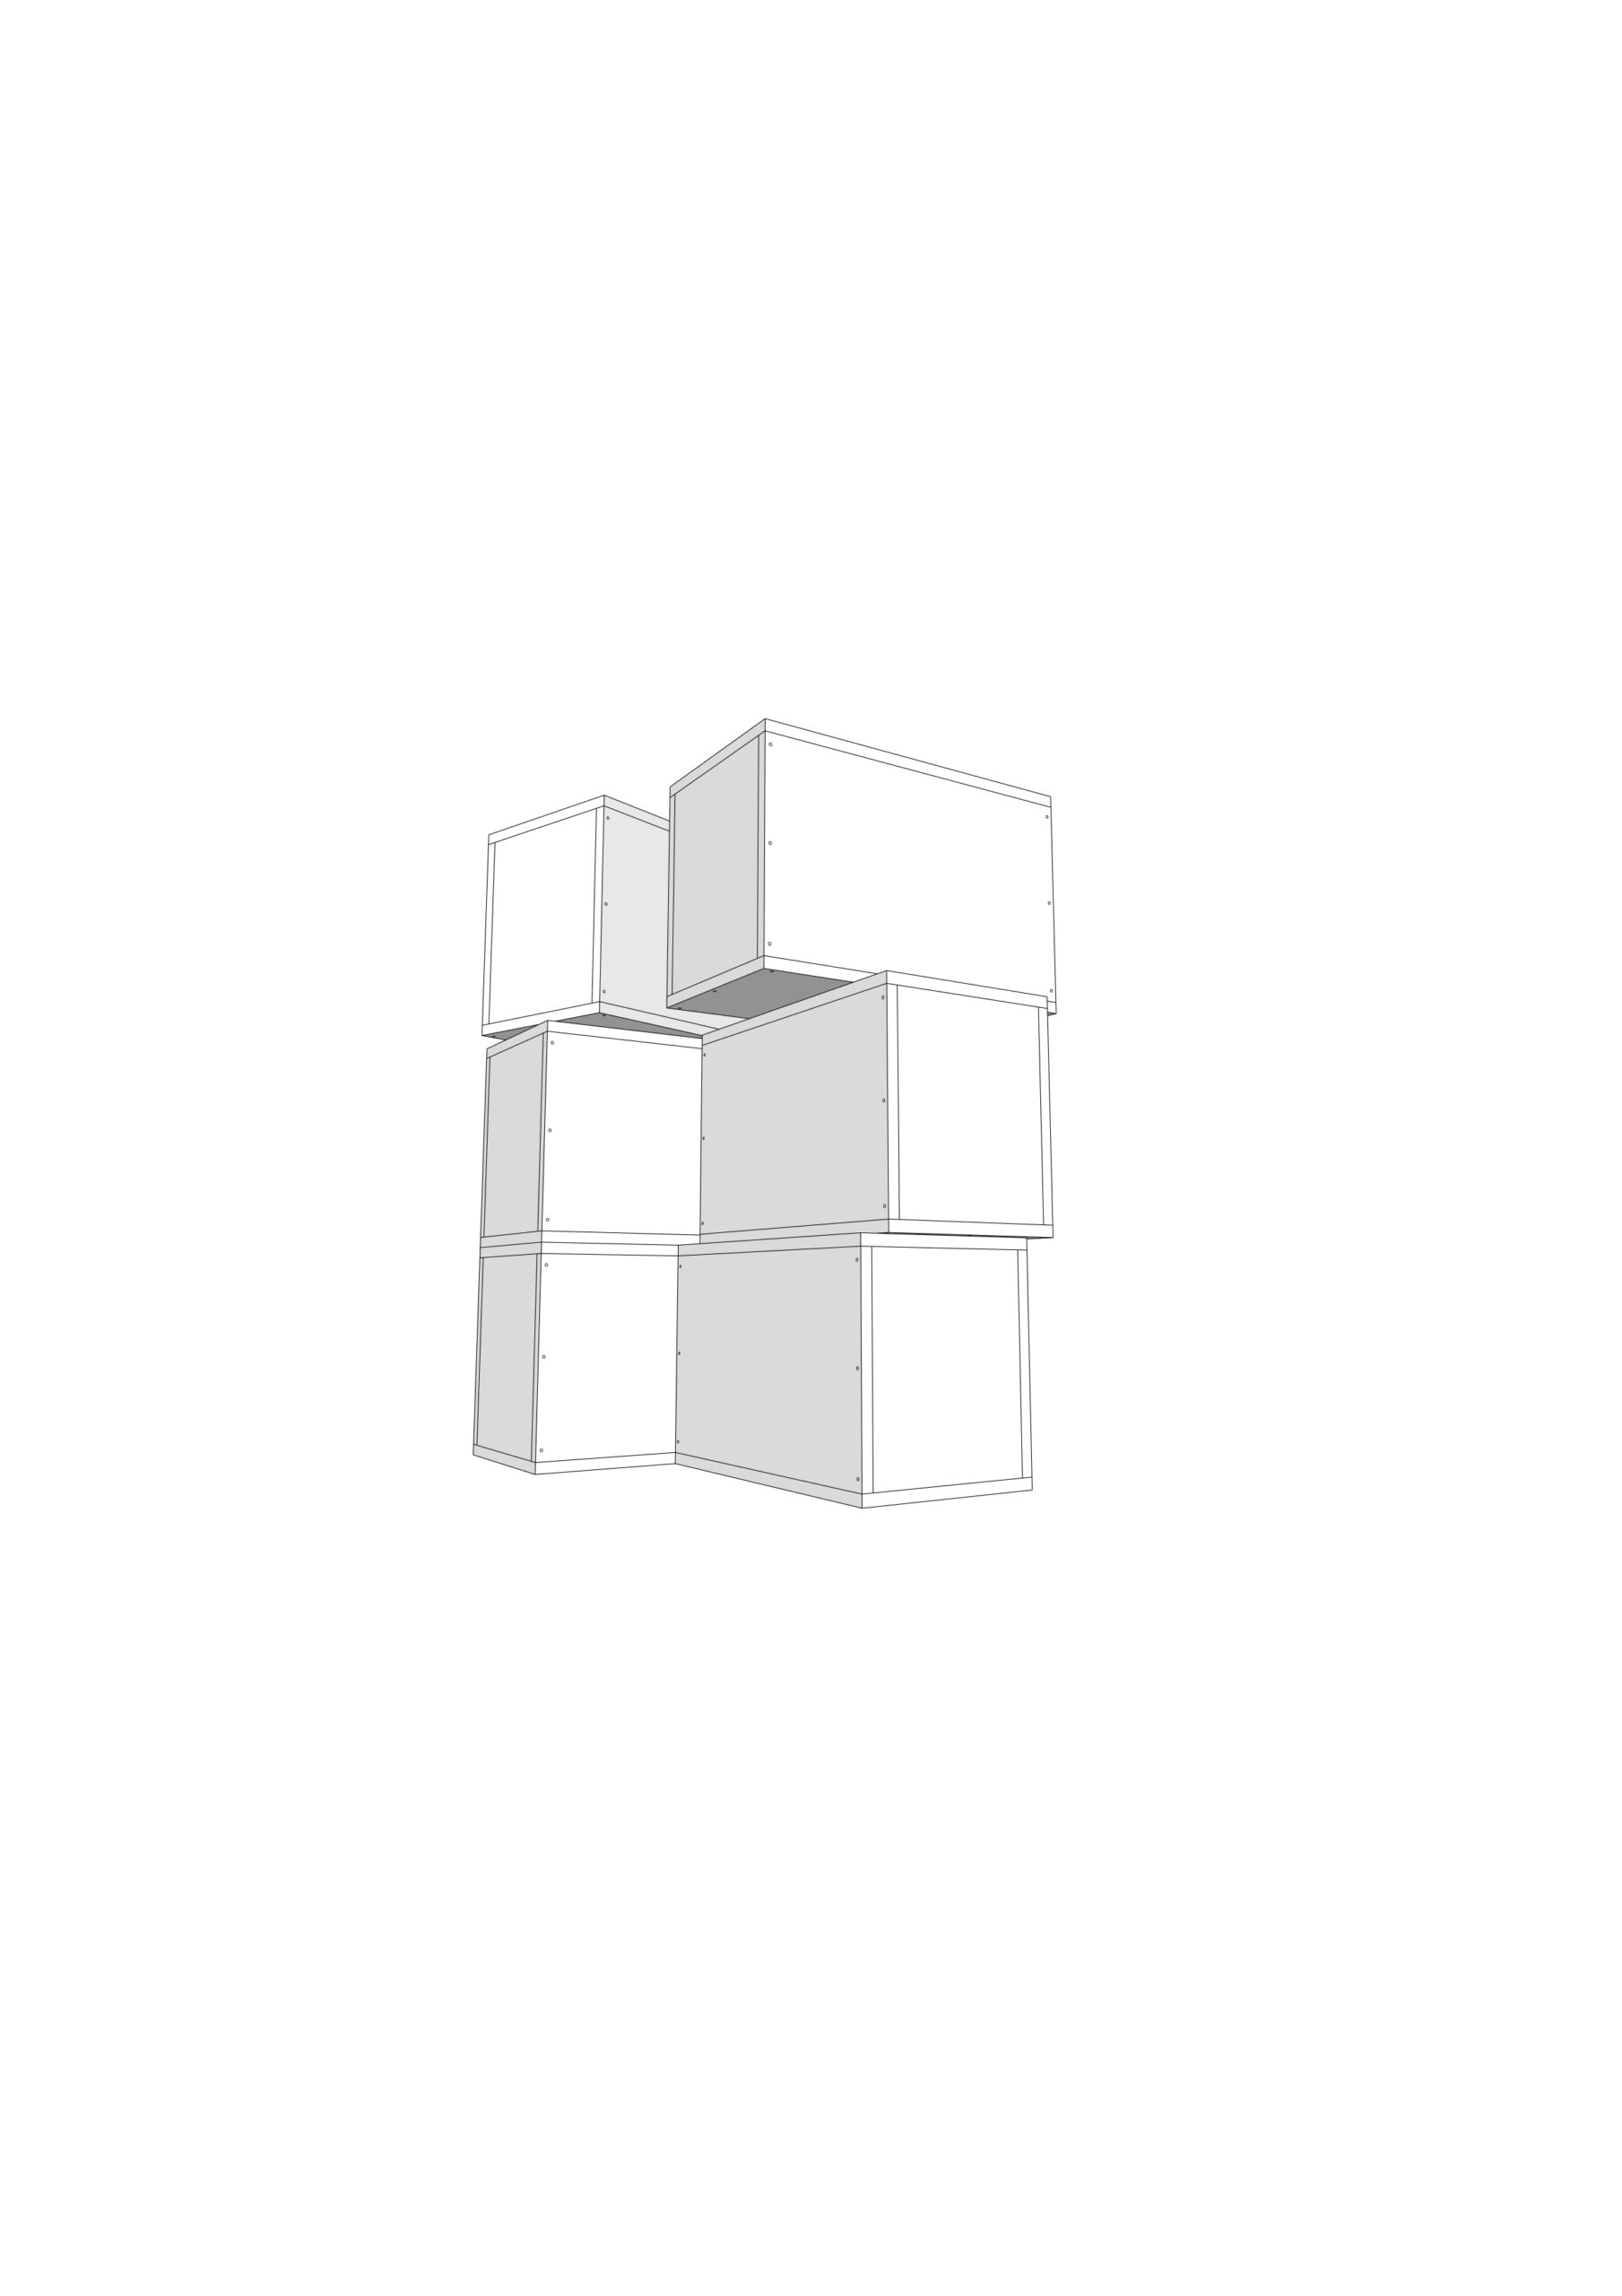 Full Size of Bauanleitung Bauplan Palettenbett Einfache Osb Kisten Skizzen Notizblog Arn Wohnzimmer Bauanleitung Bauplan Palettenbett